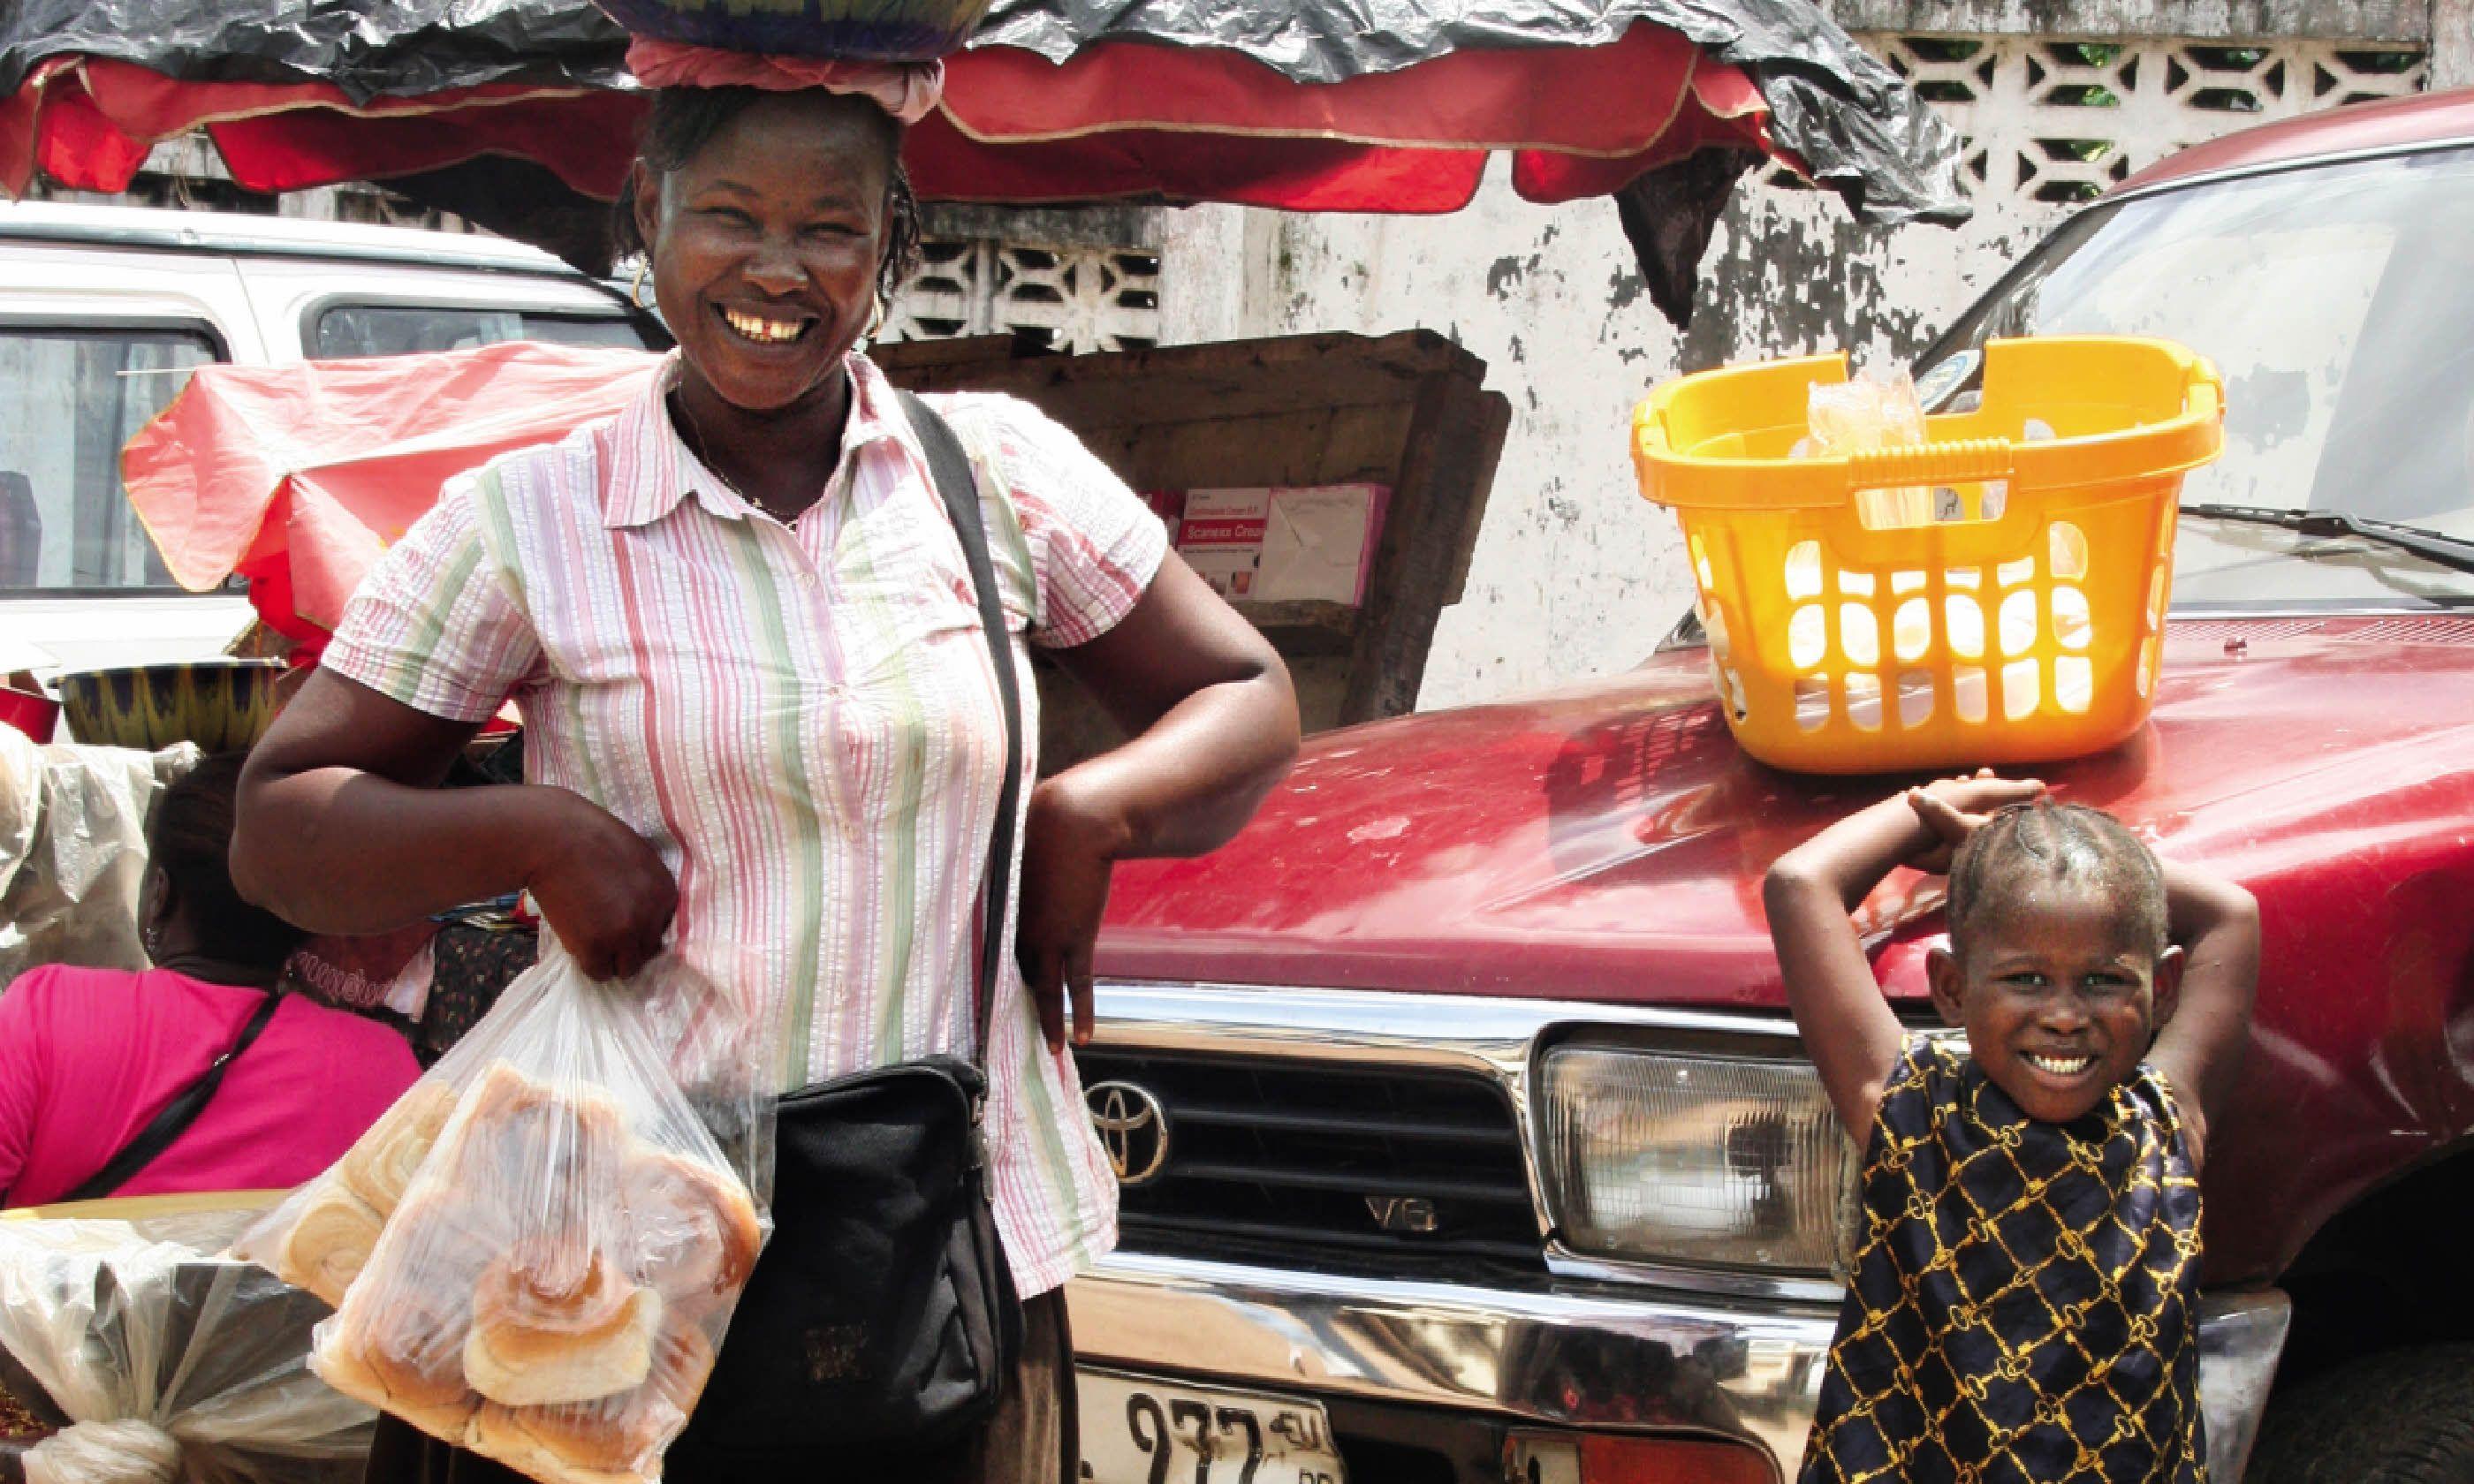 The spirit of enterprise is getting back on its feet in Freetown (Nick Redmayne)